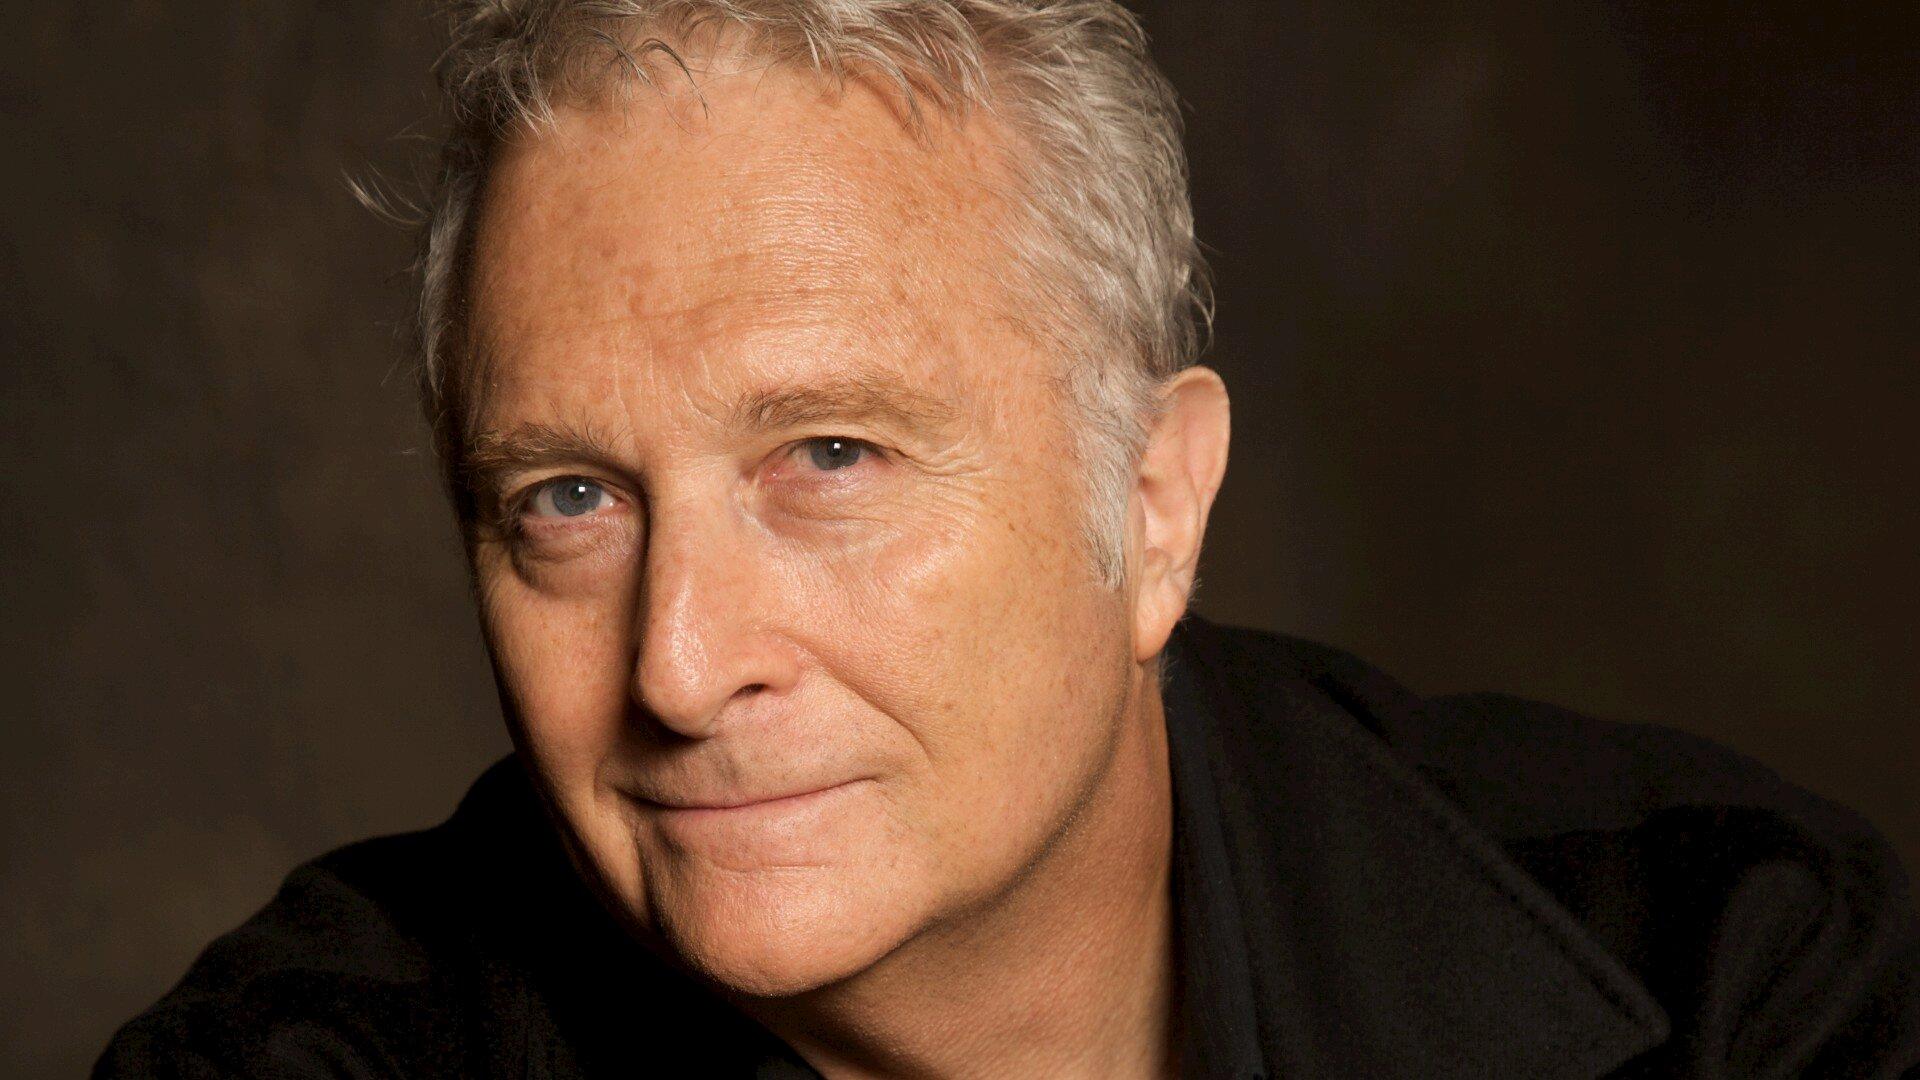 Randy Newman Paris Tickets La Cigale June 23 2020